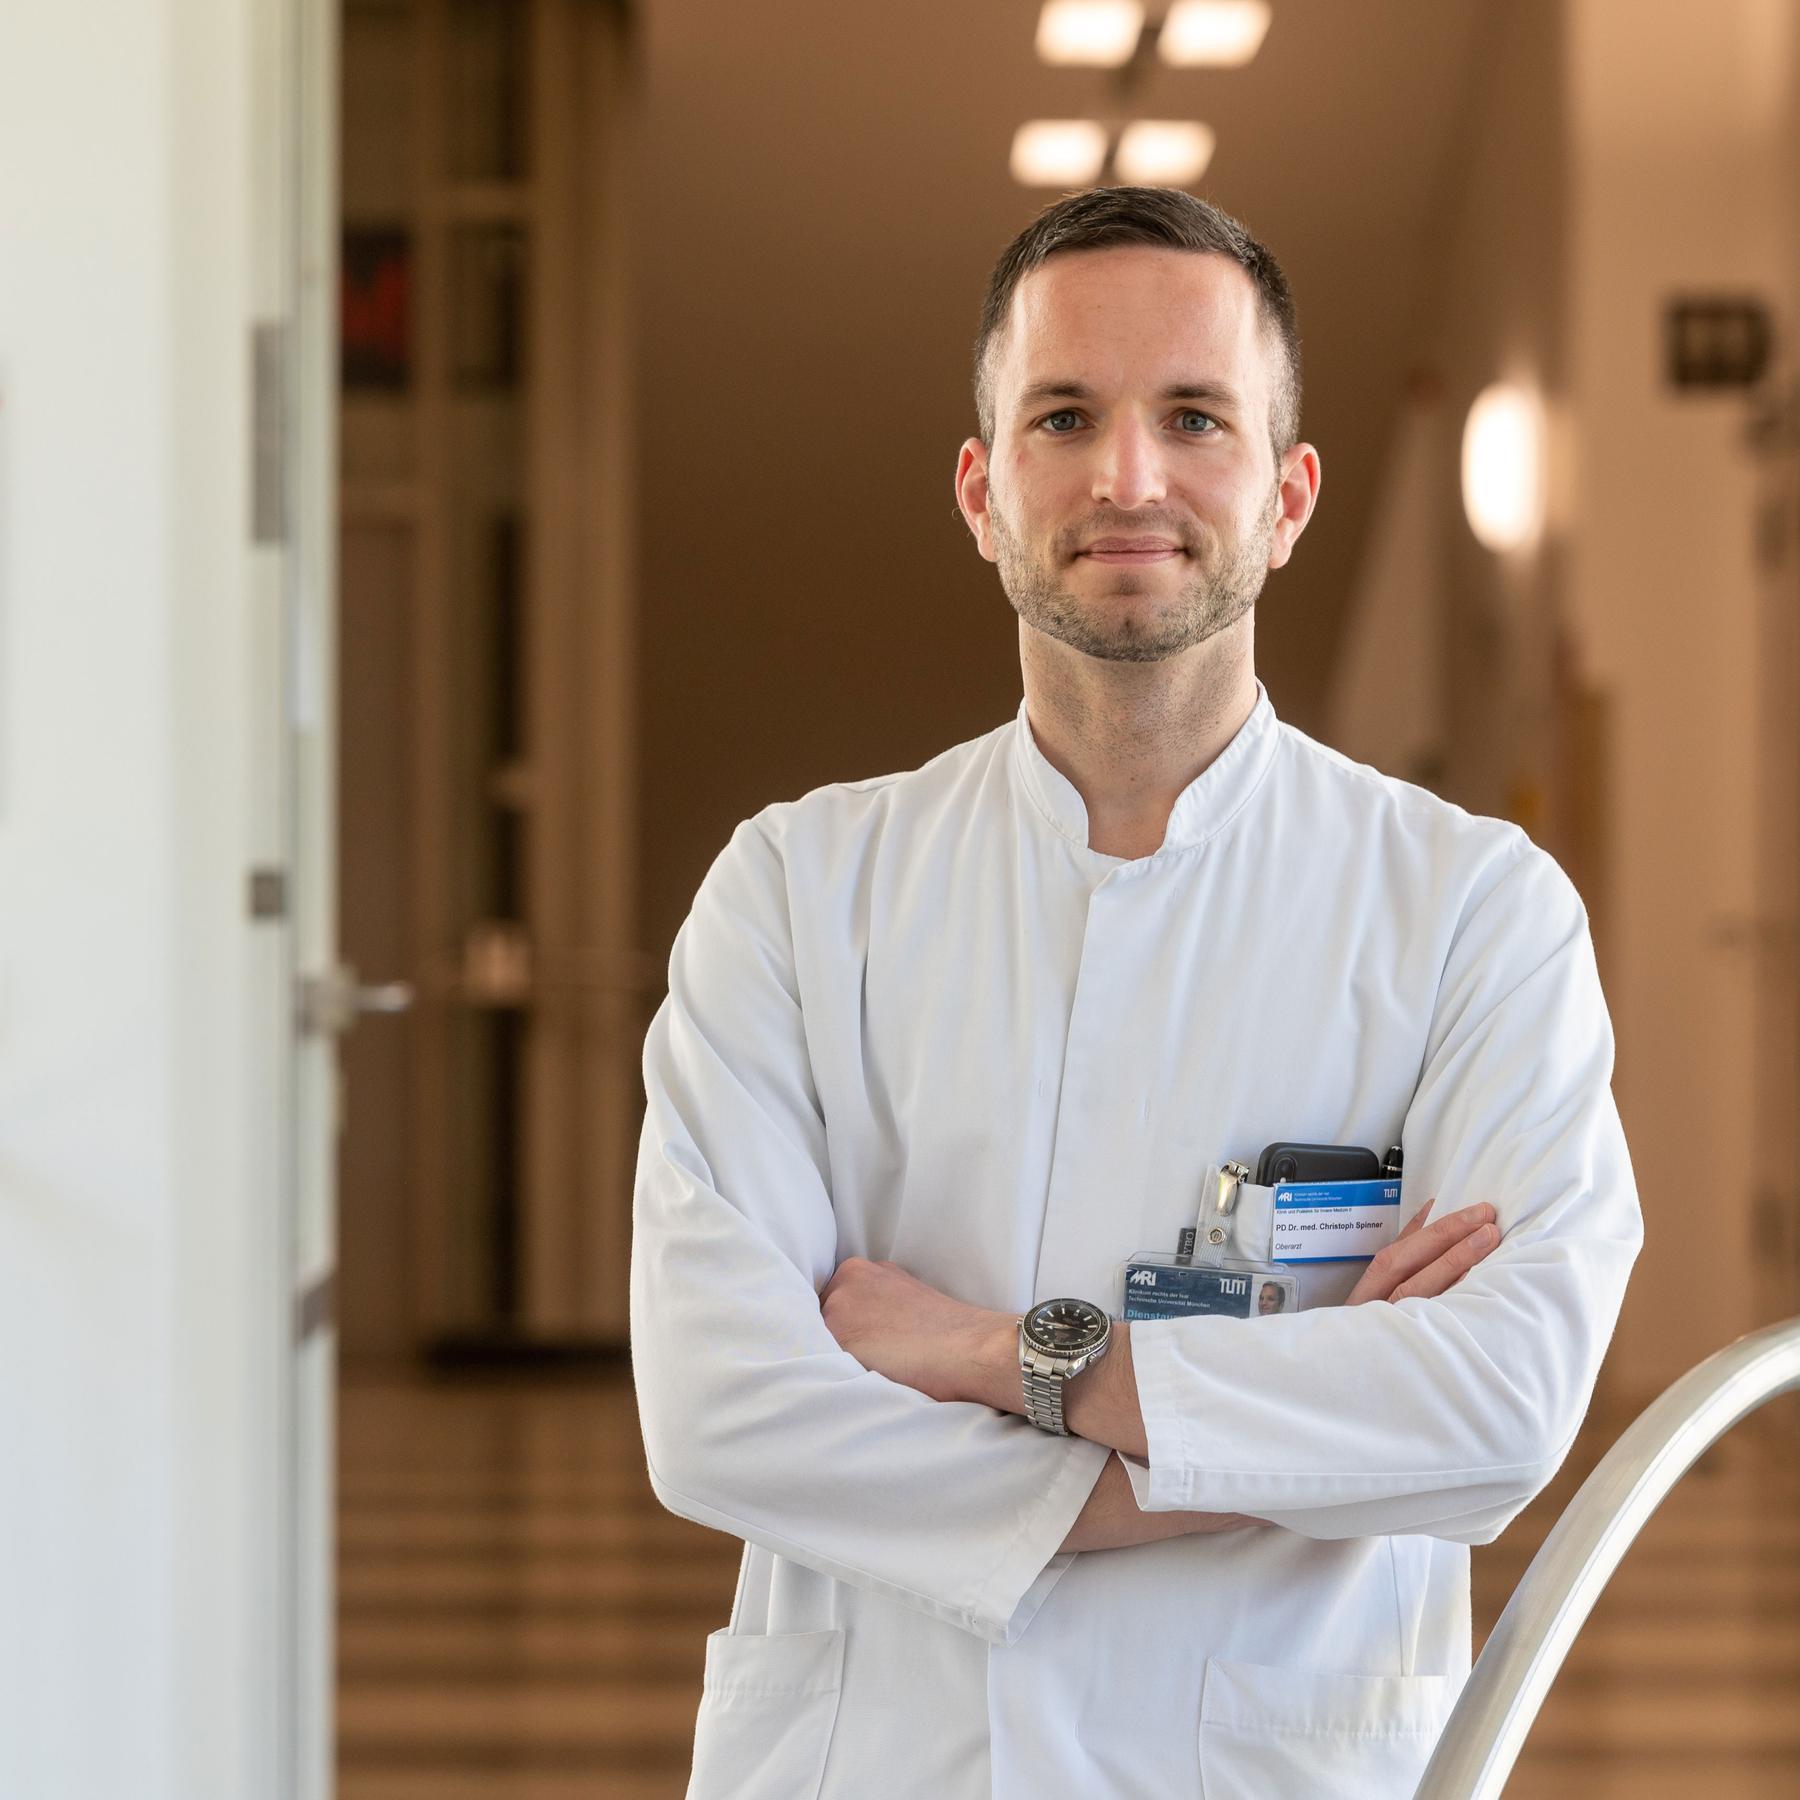 Corona-News mit Dr. Christoph Spinner (11.05.2021)